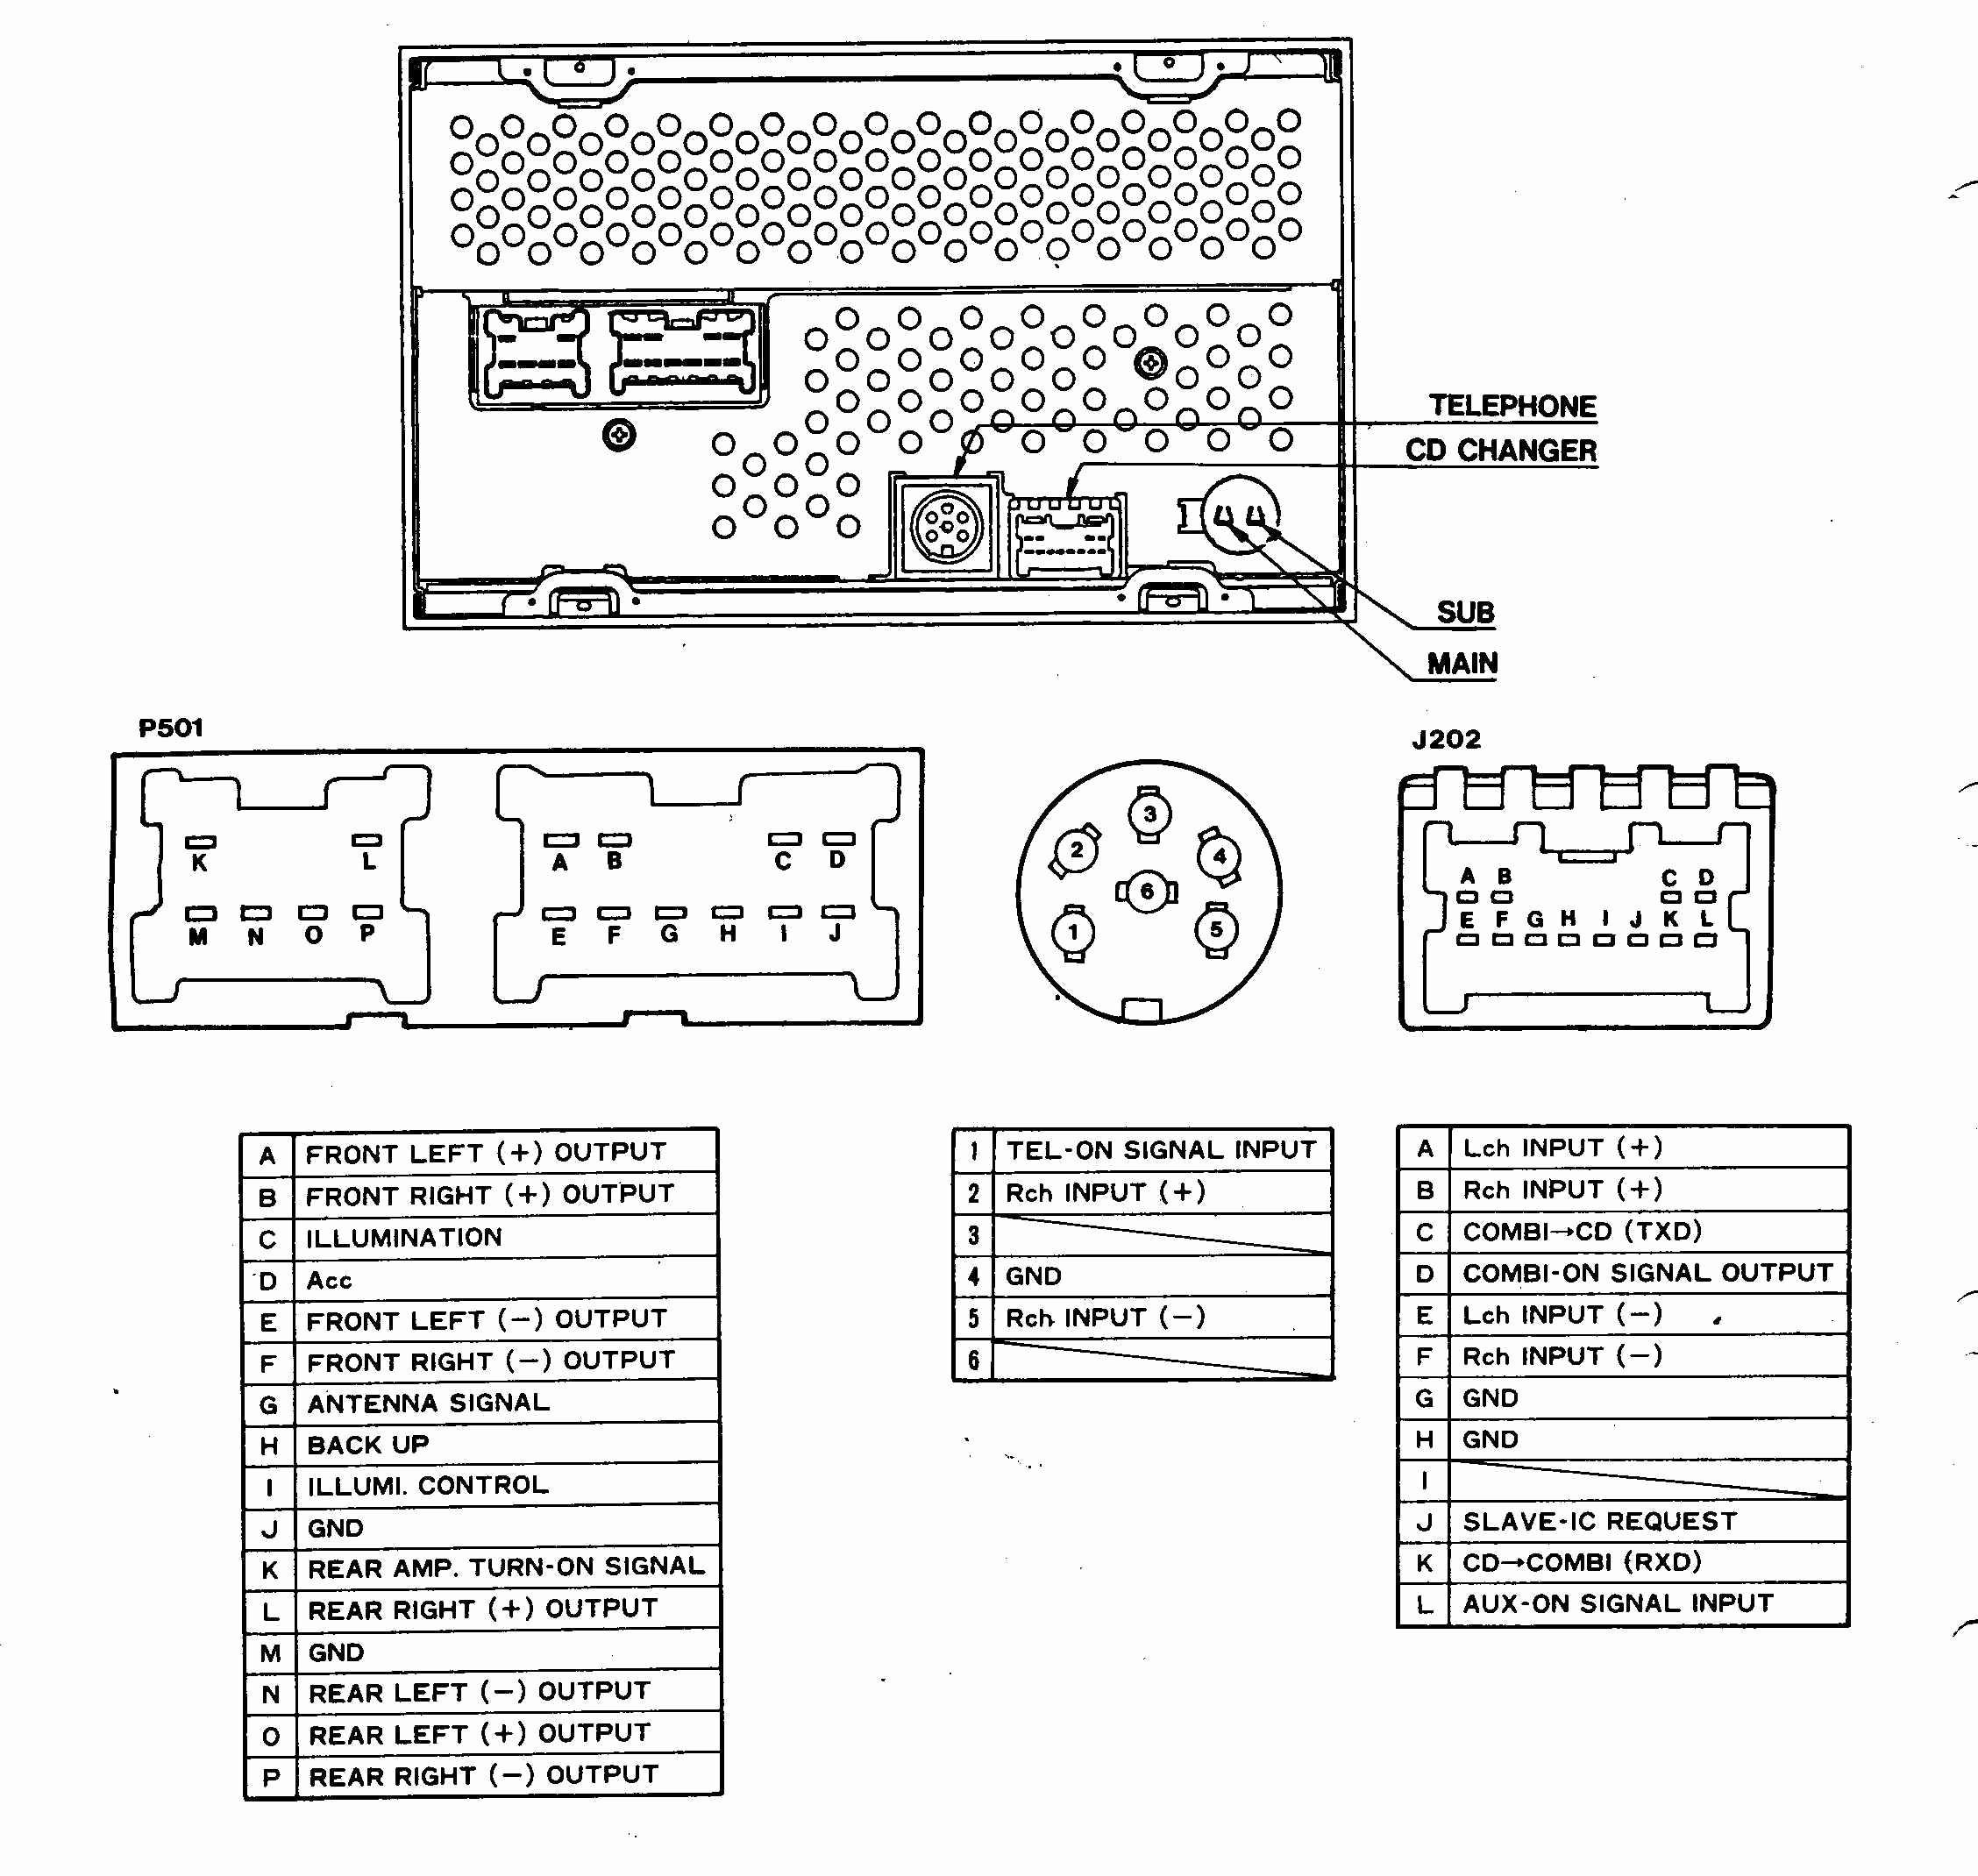 d6ffc 2005 nissan altima headlight wiring diagram | wiring resources  wiring resources